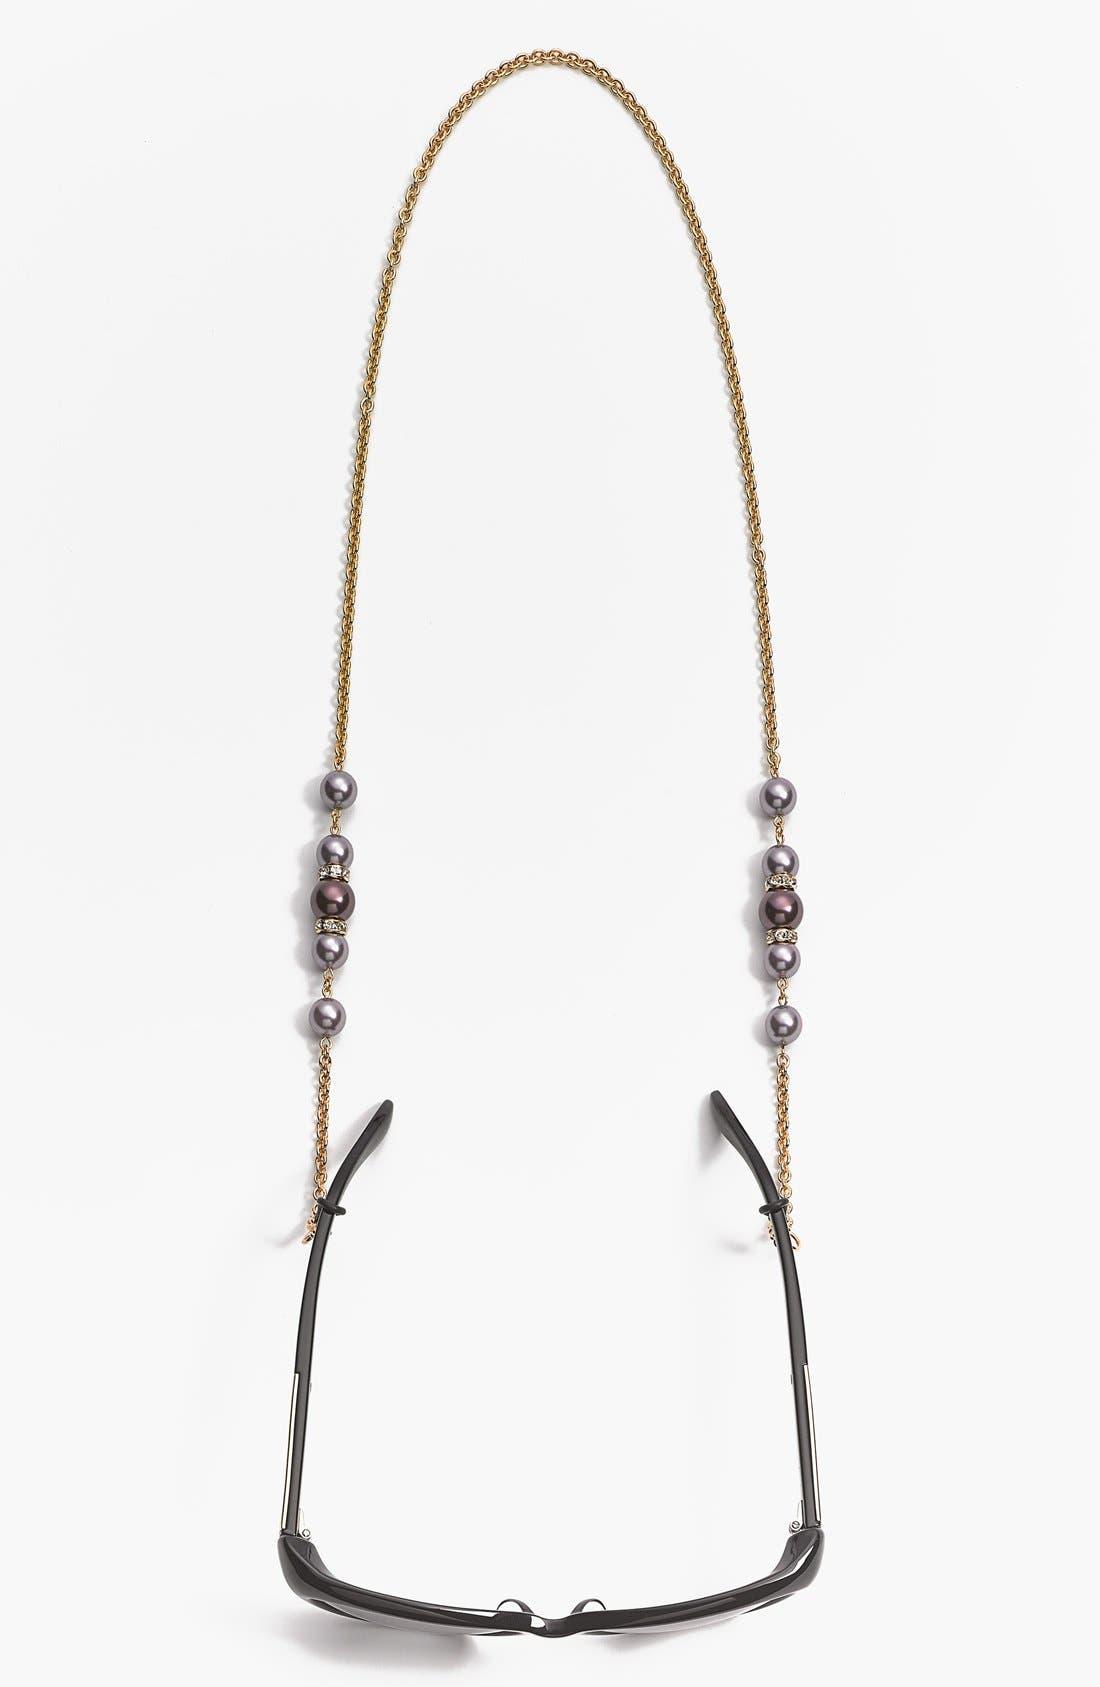 'Cadabra' Swarovski Crystal Eyeglass Chain,                             Alternate thumbnail 2, color,                             Burgundy/ Gold